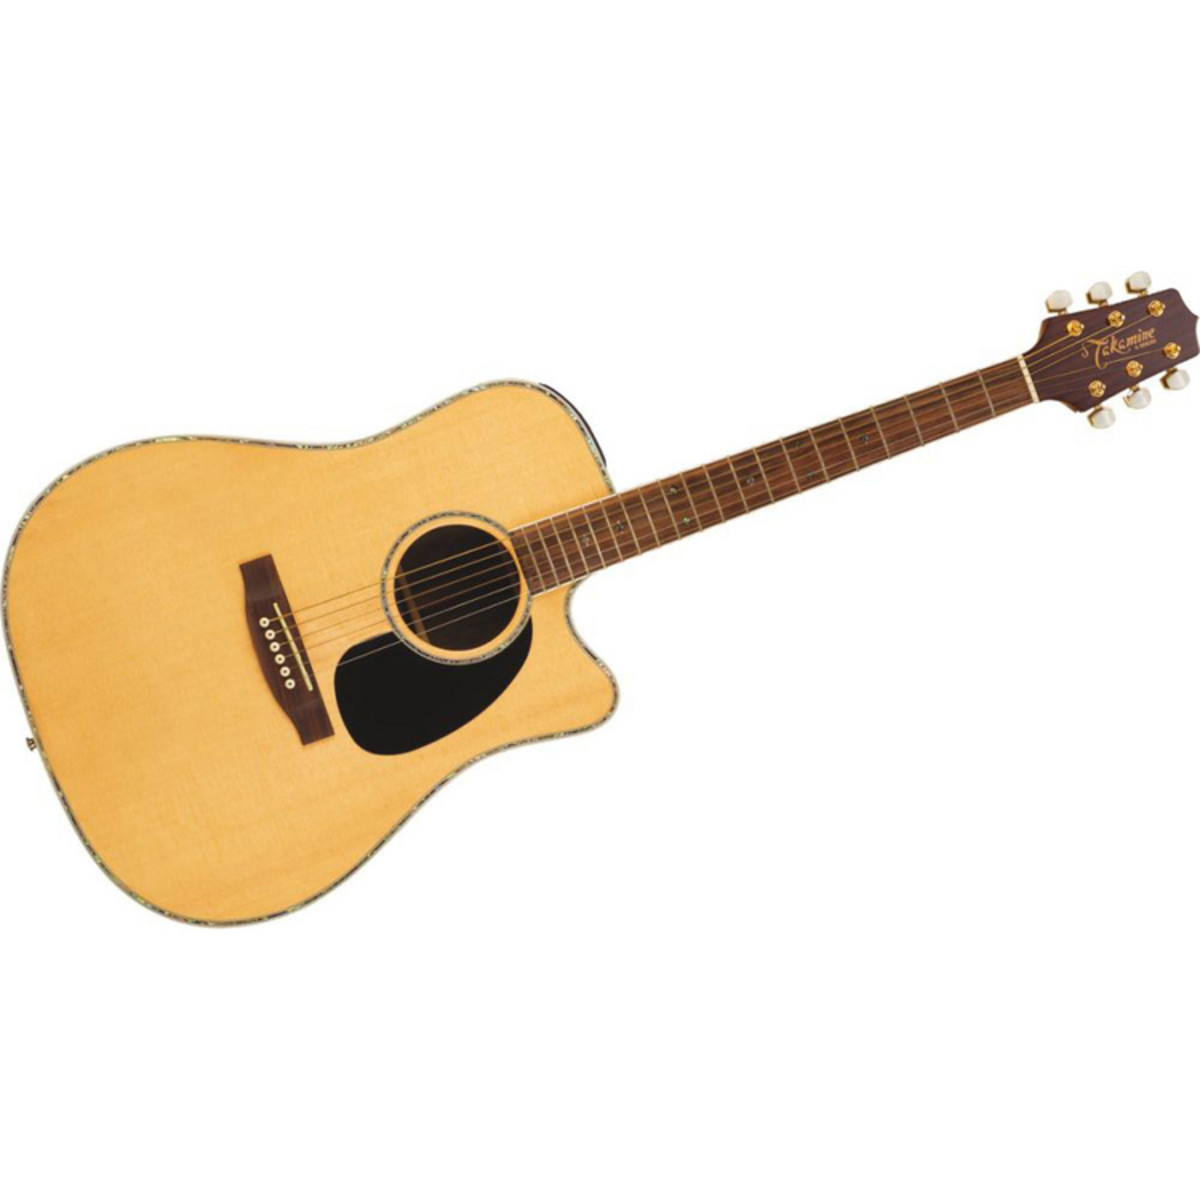 disc takamine eg360sc g series electro acoustic guitar at. Black Bedroom Furniture Sets. Home Design Ideas